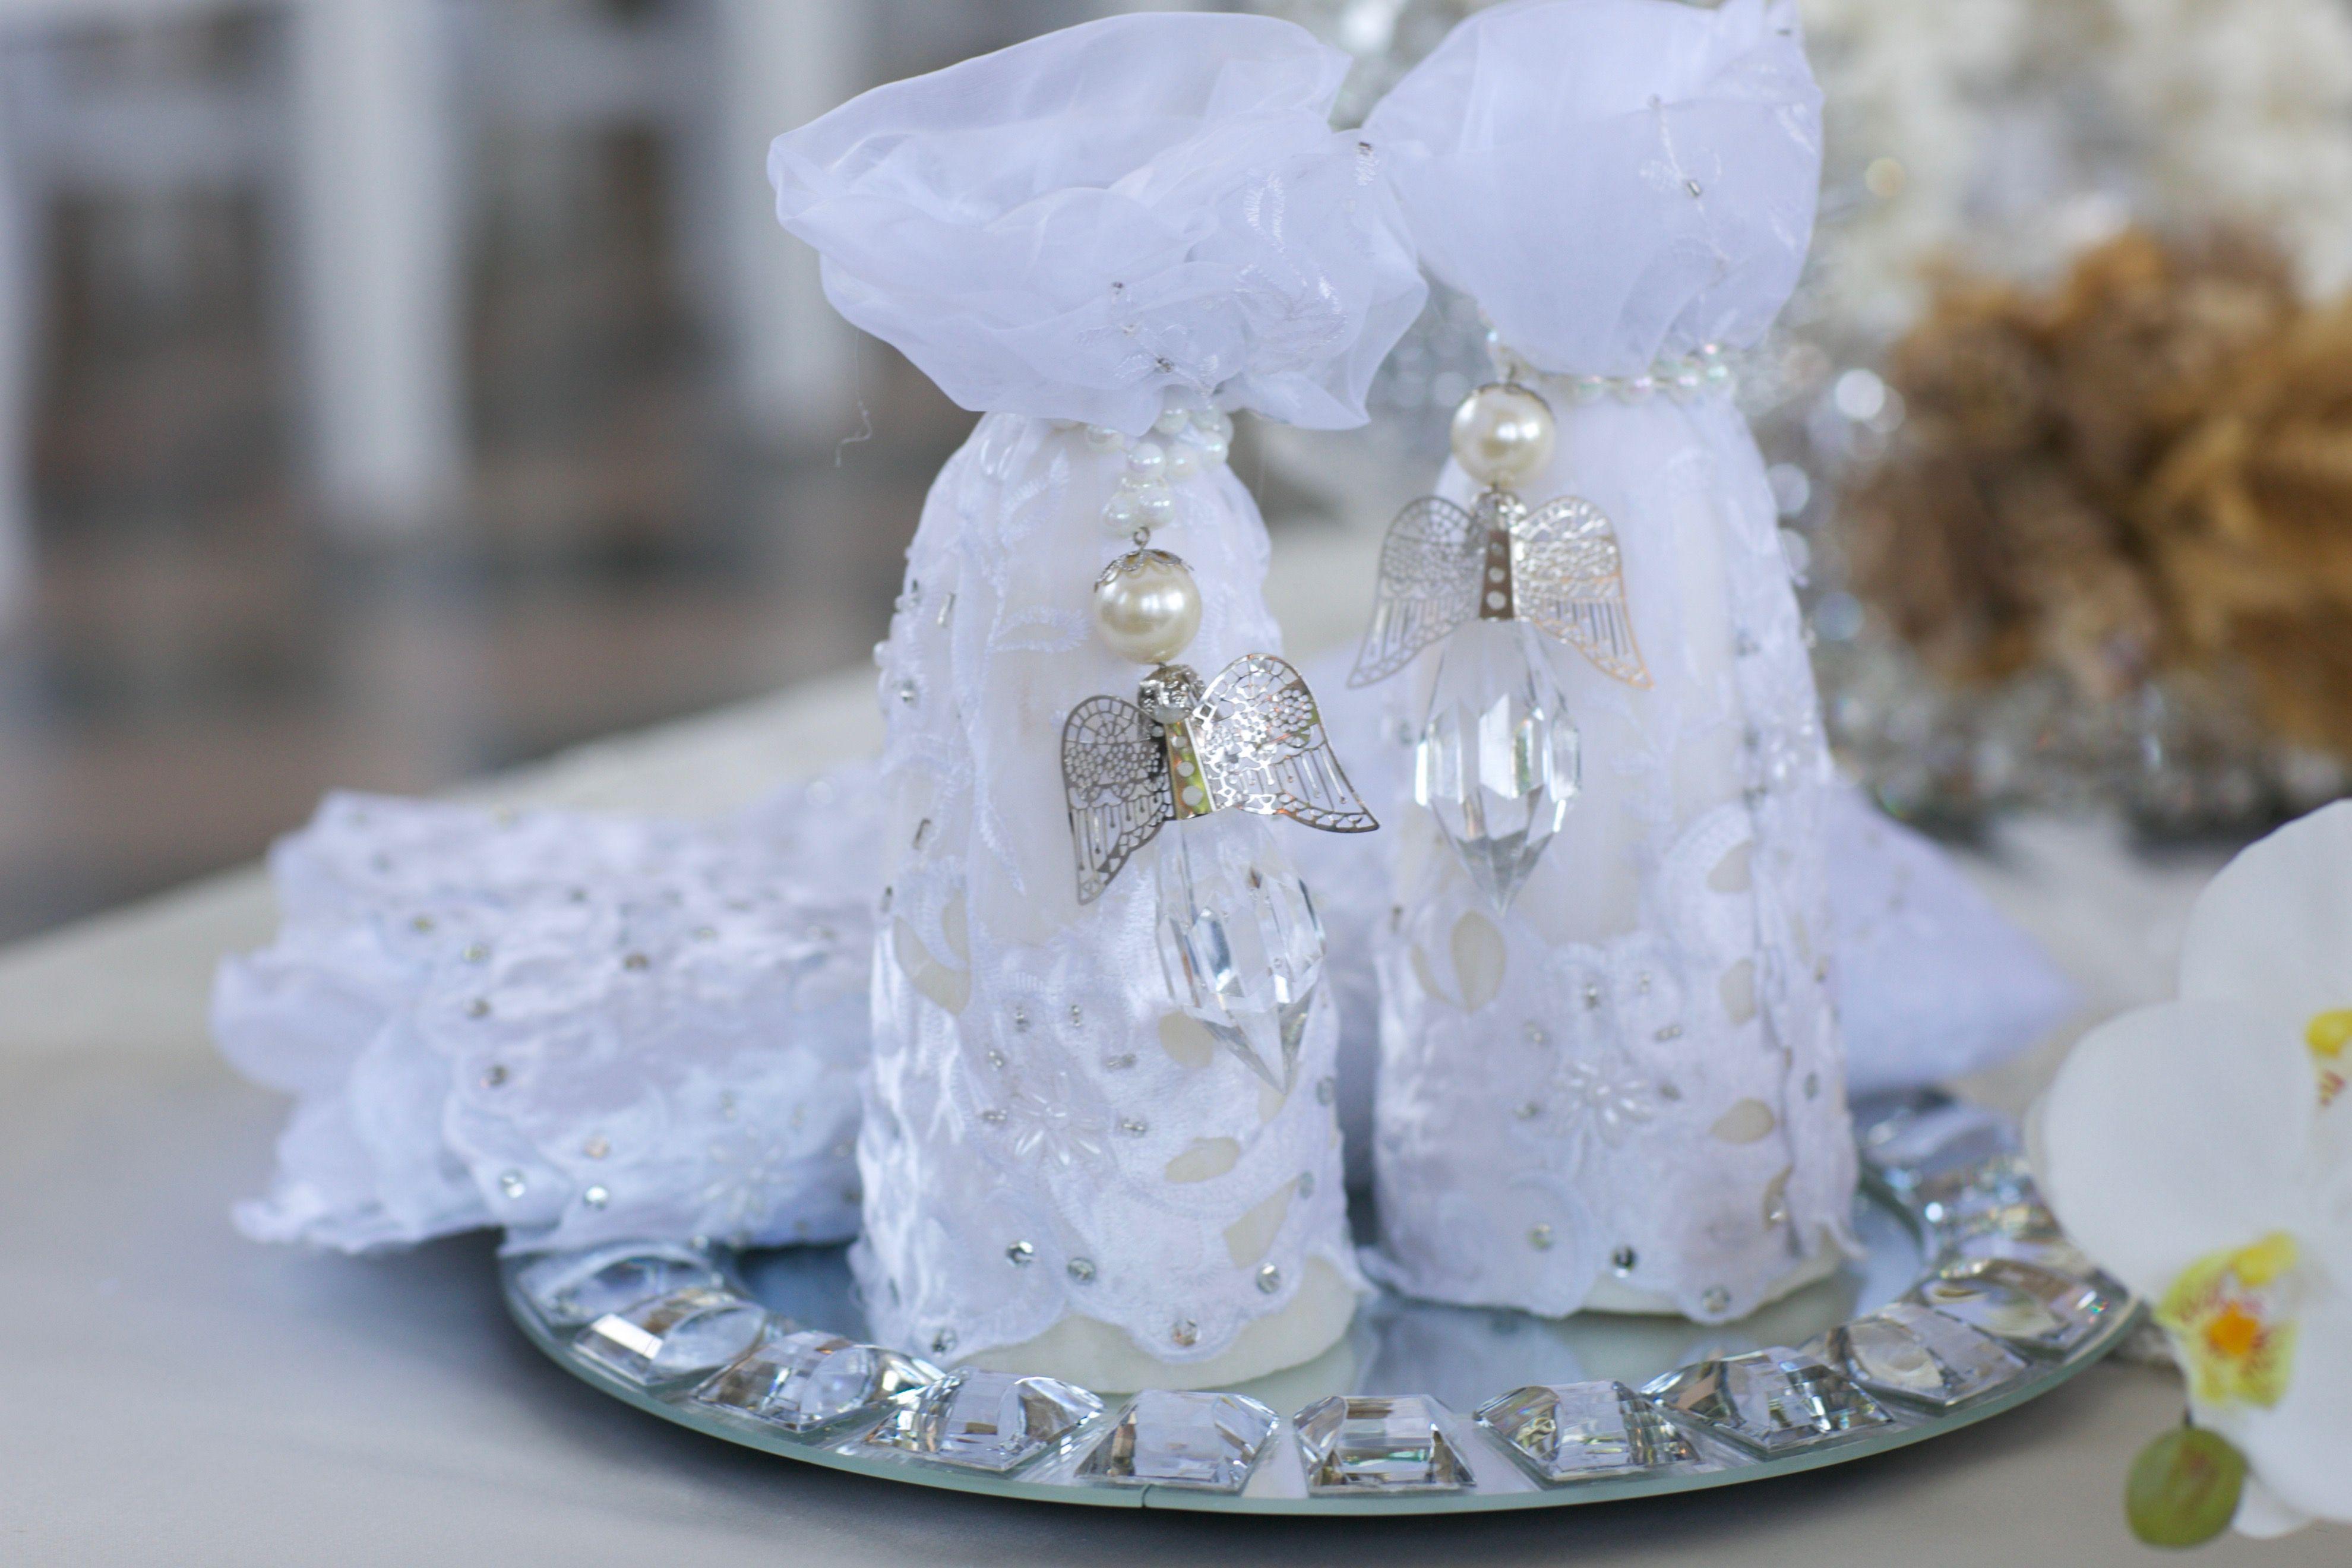 persianiranian weddingsofre aghd kale ghandsugar conedecration